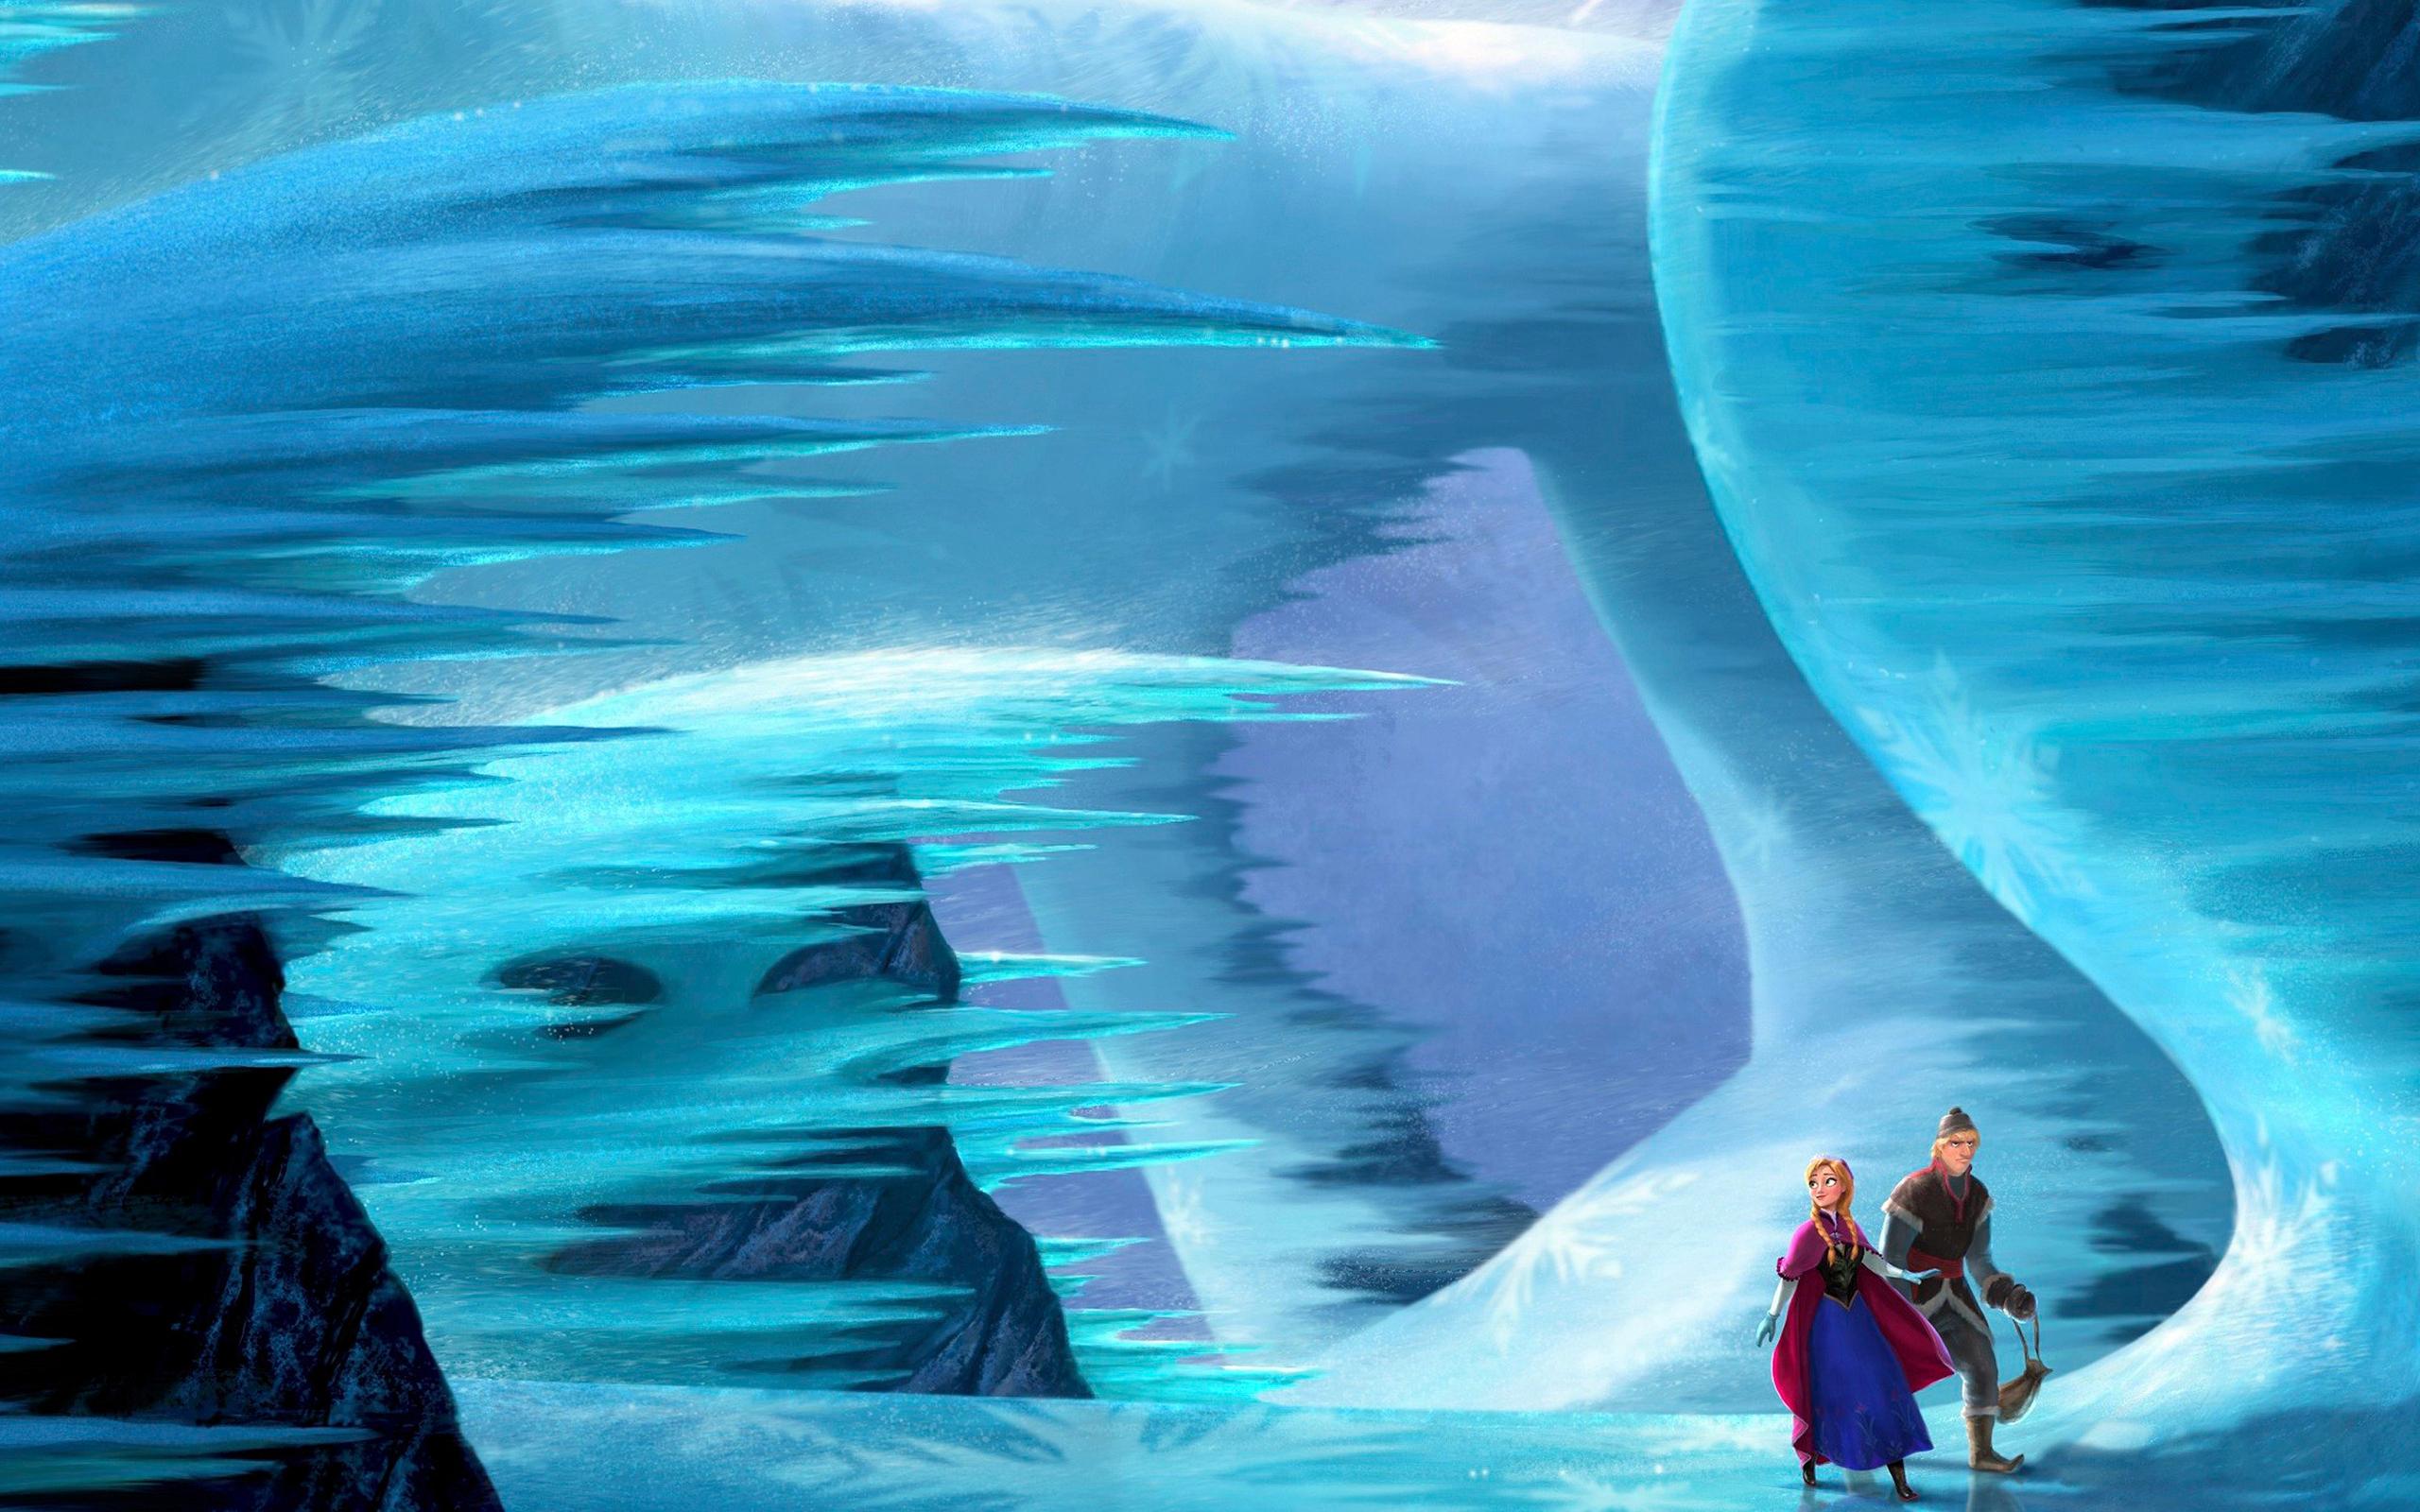 Frozen wallpapers pictures images - Wallpaper for frozen ...